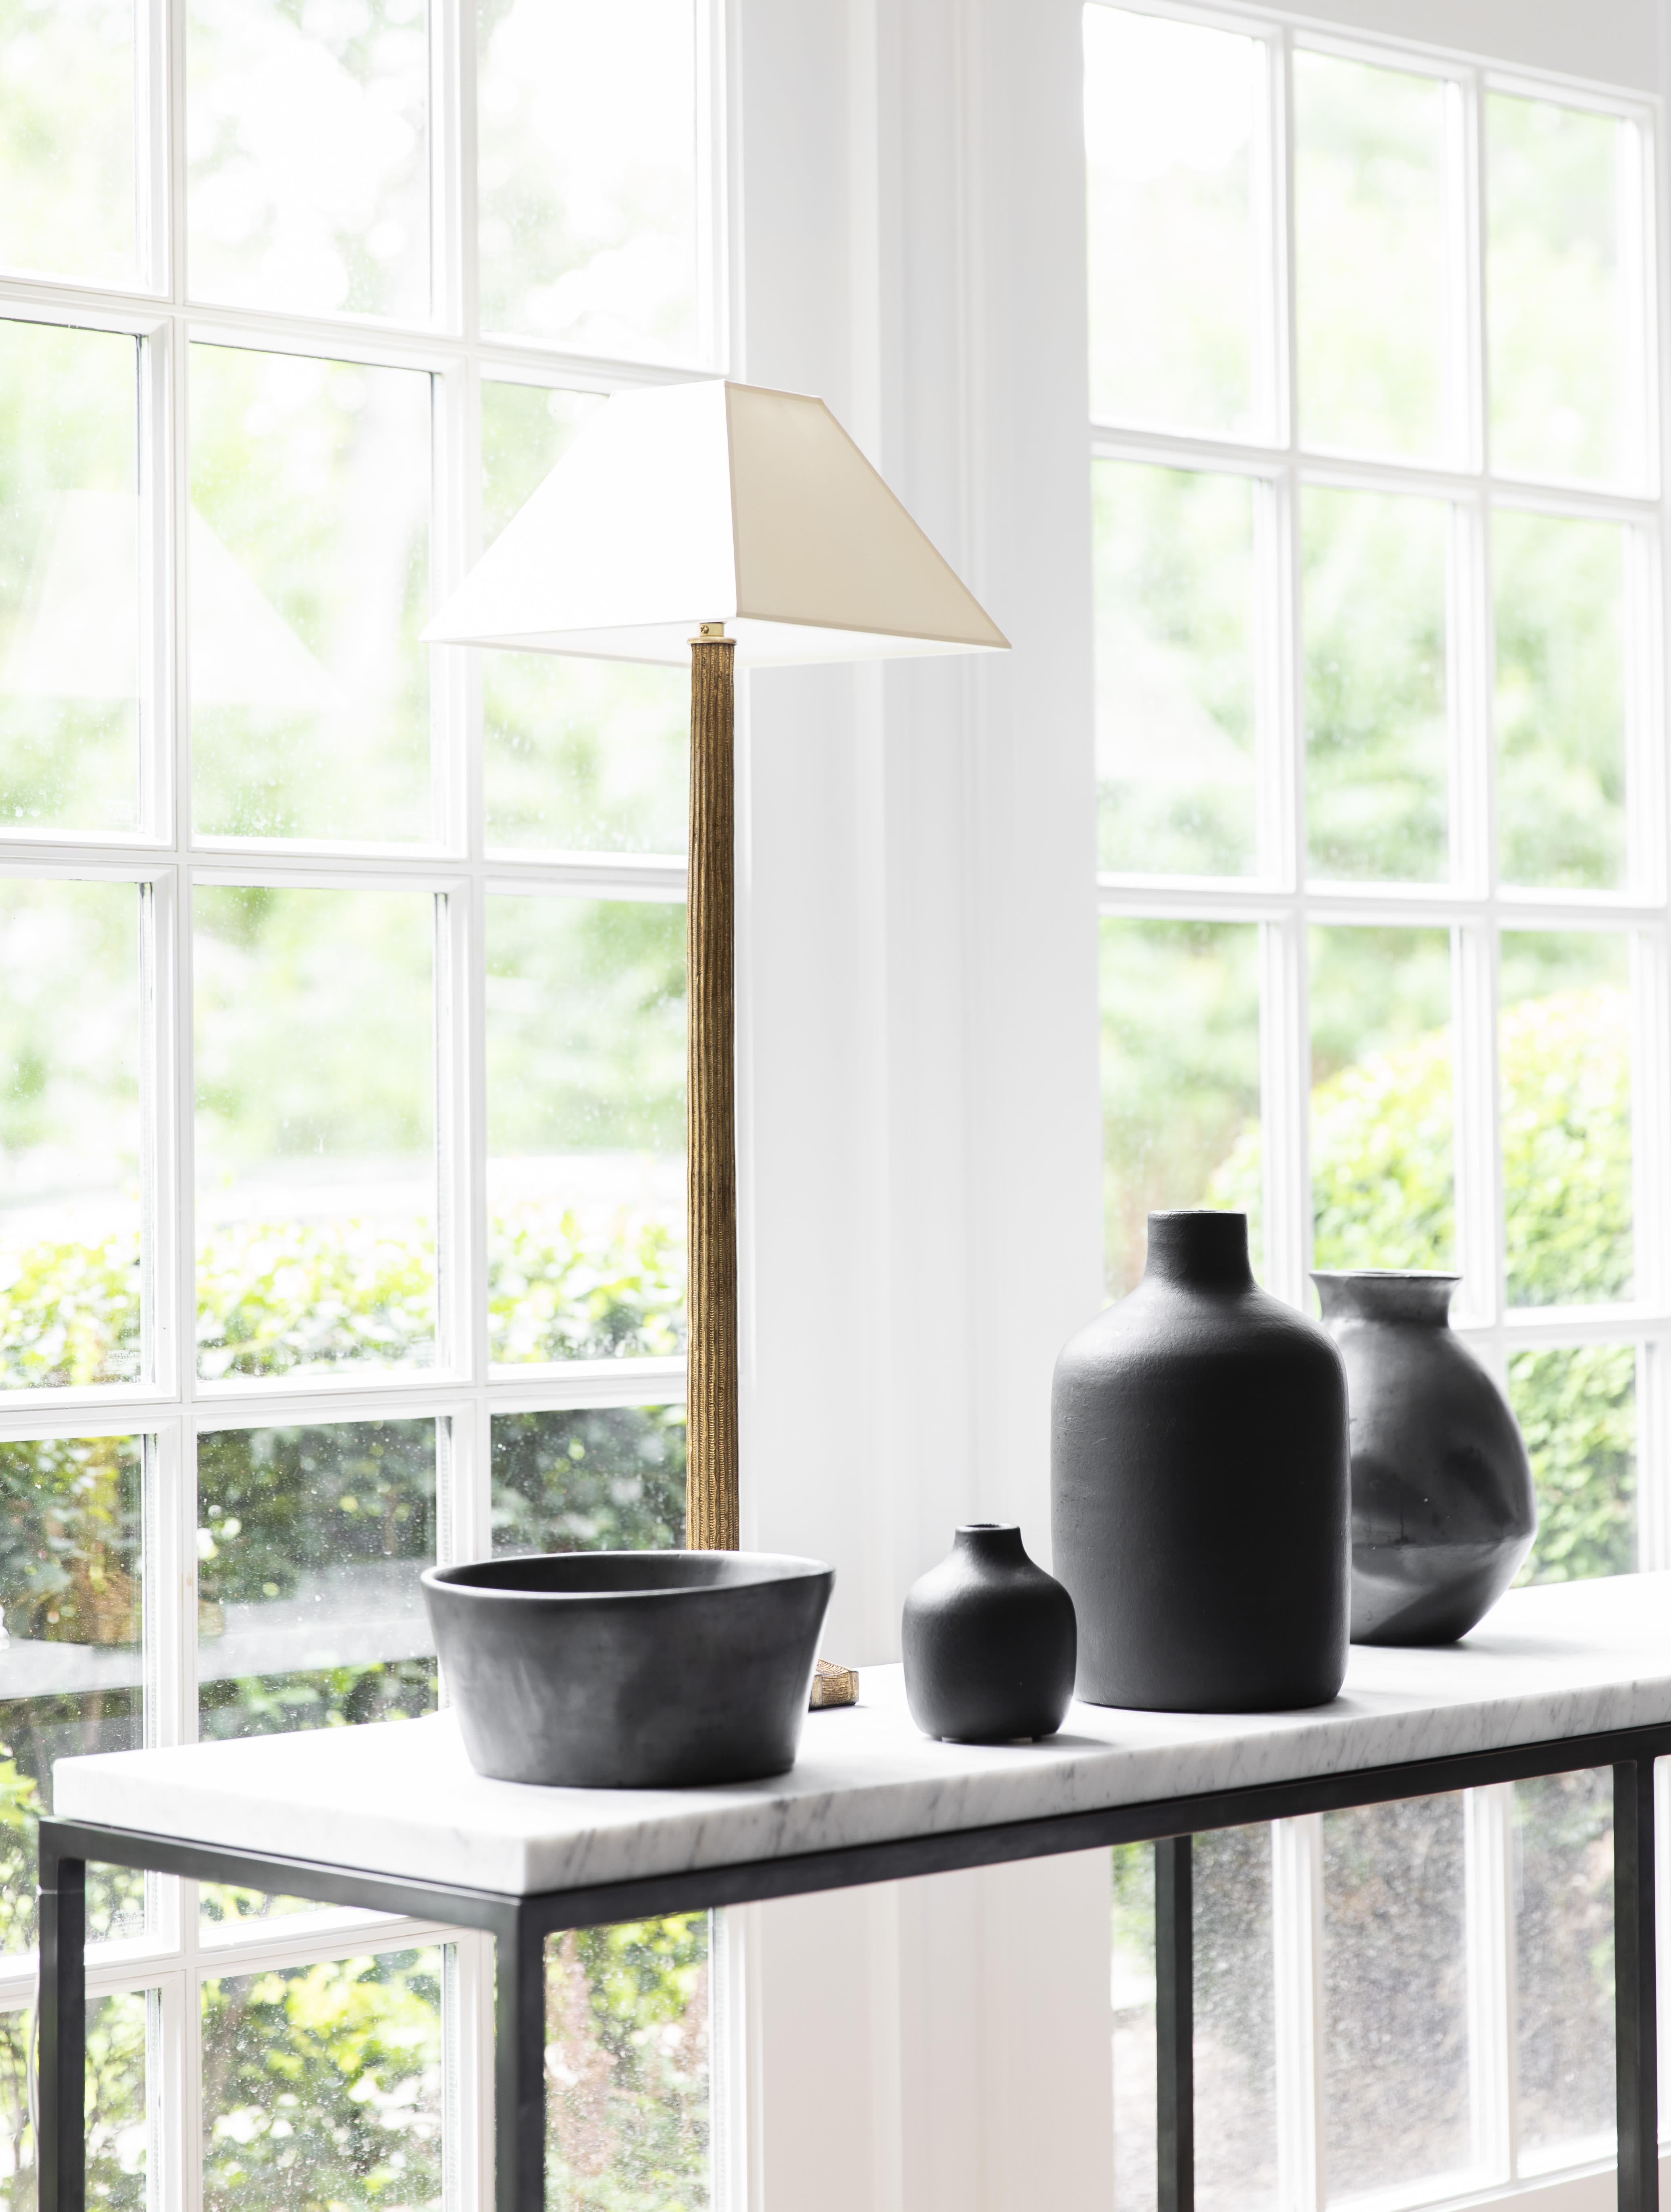 Strie Buffet Lamp by Chapman & Myers